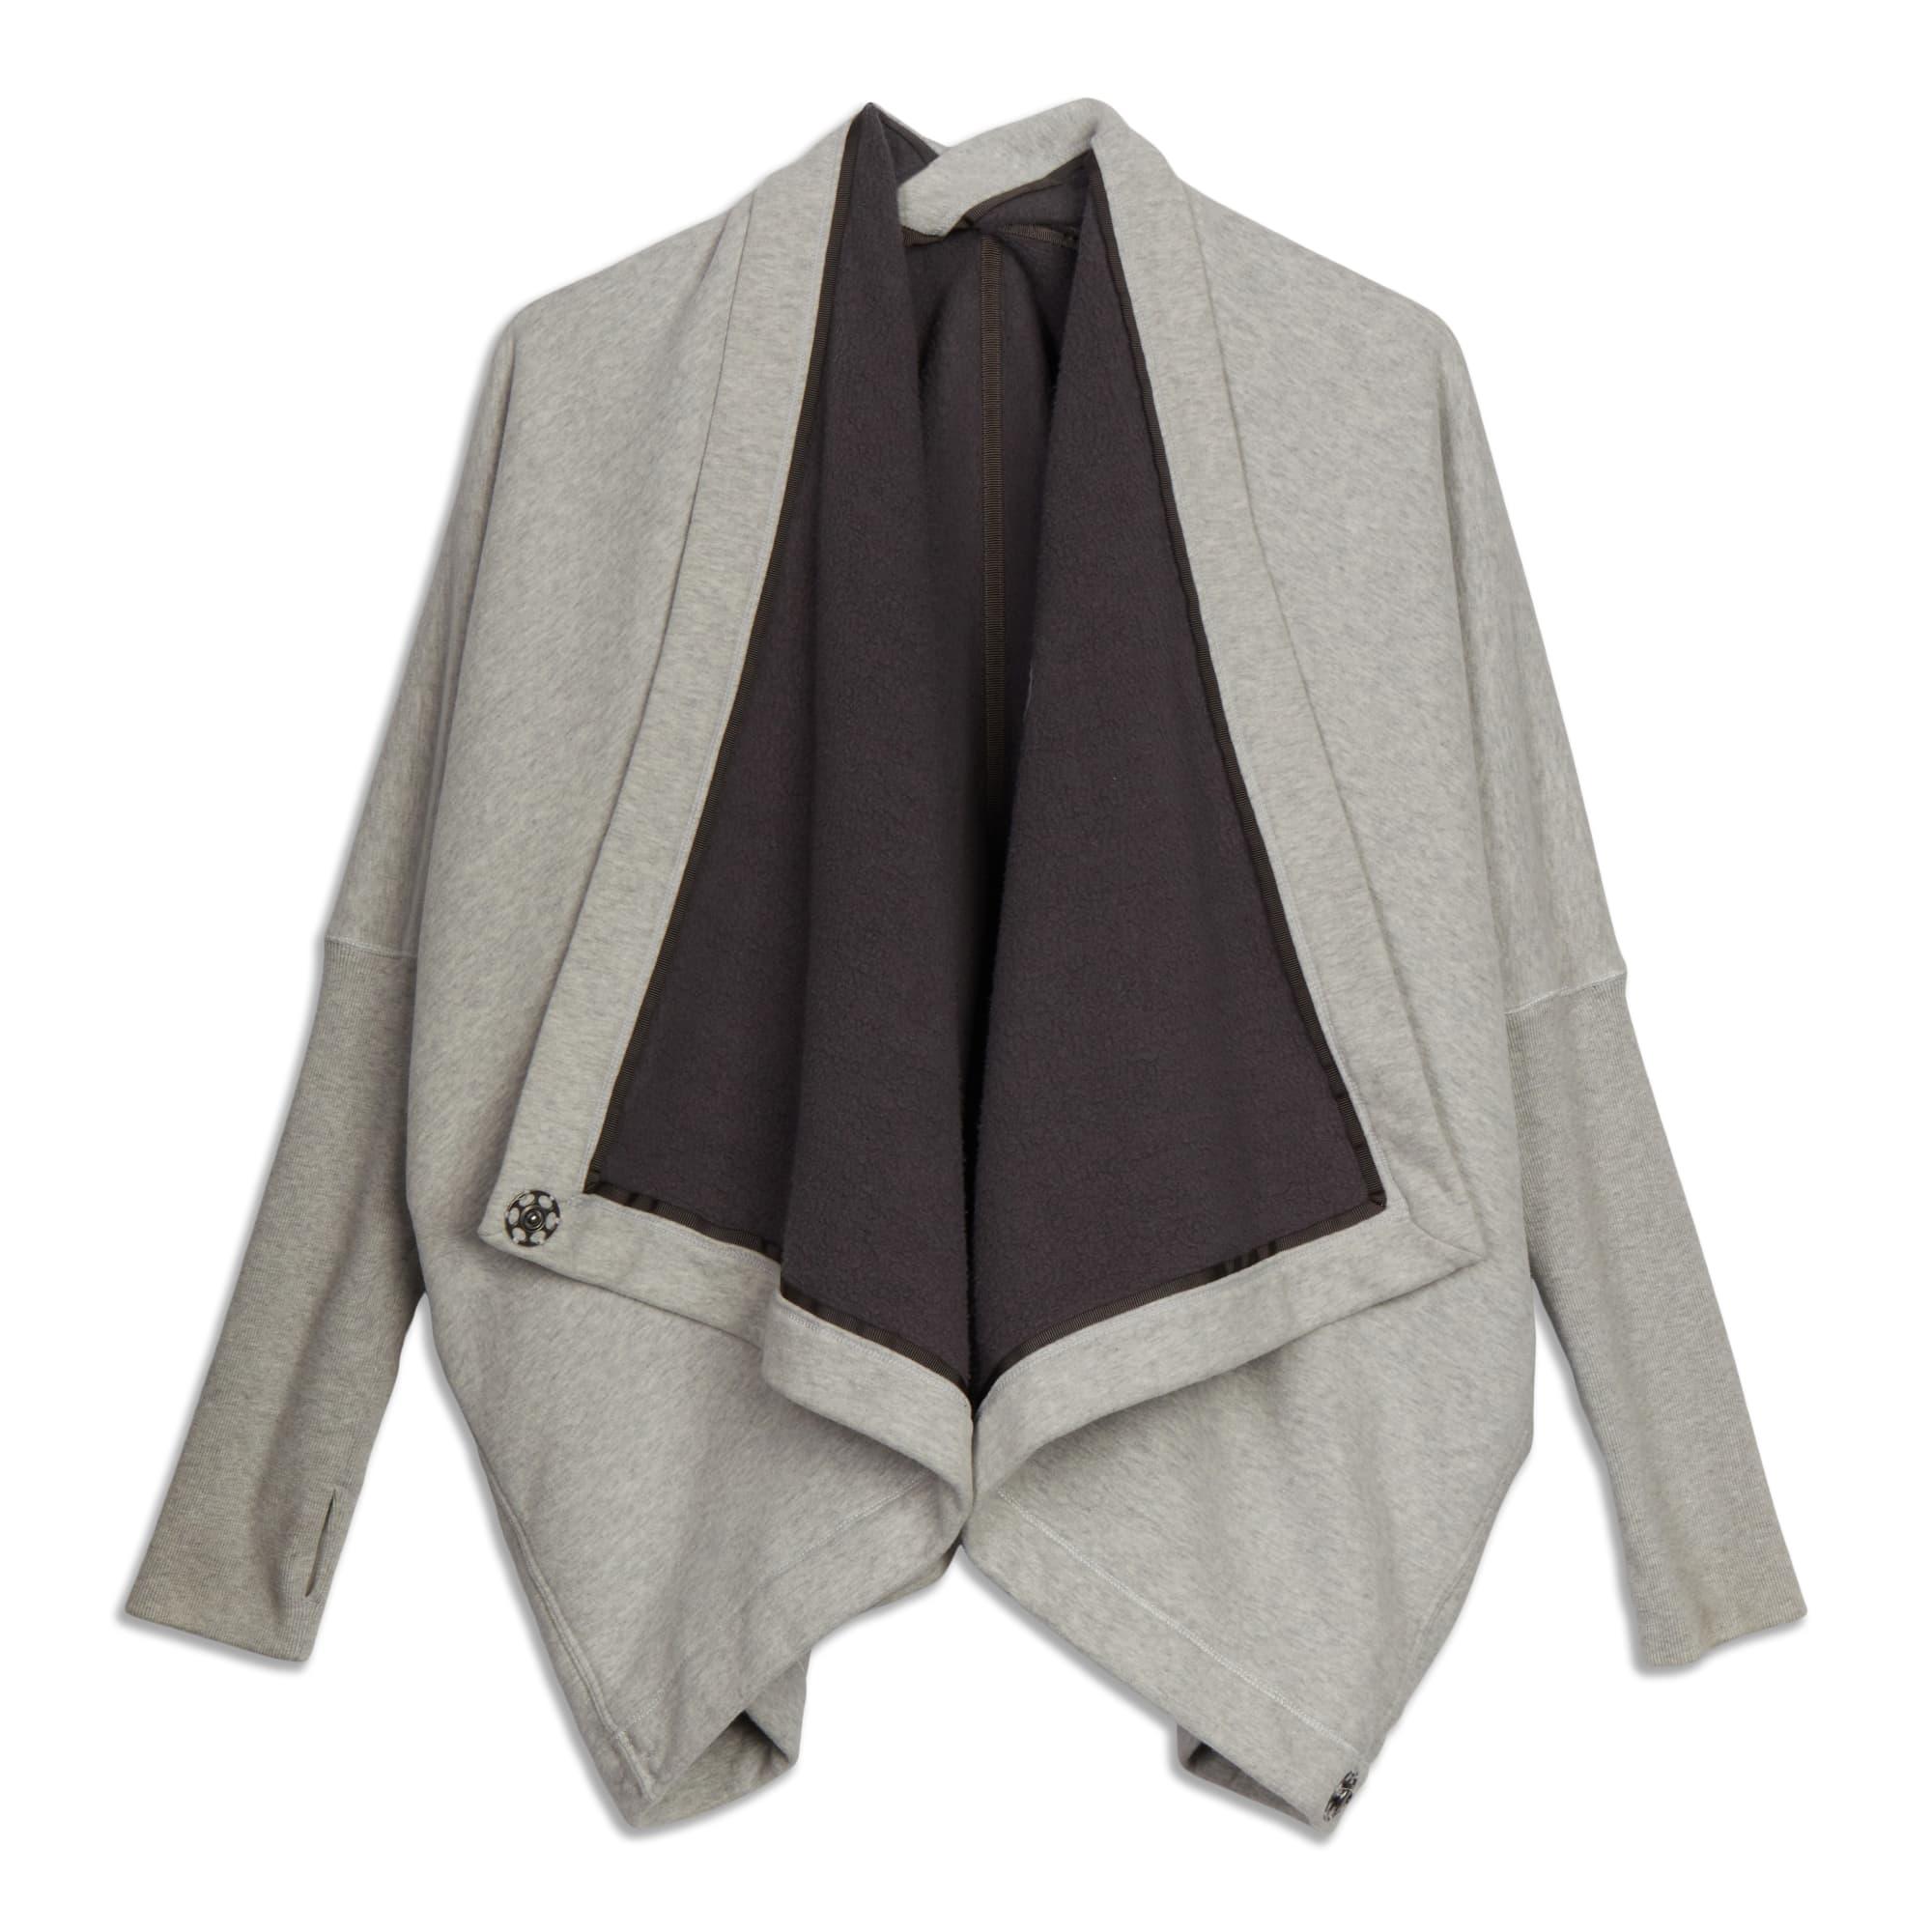 Main product image: Women's Wrap Sweater - Resale